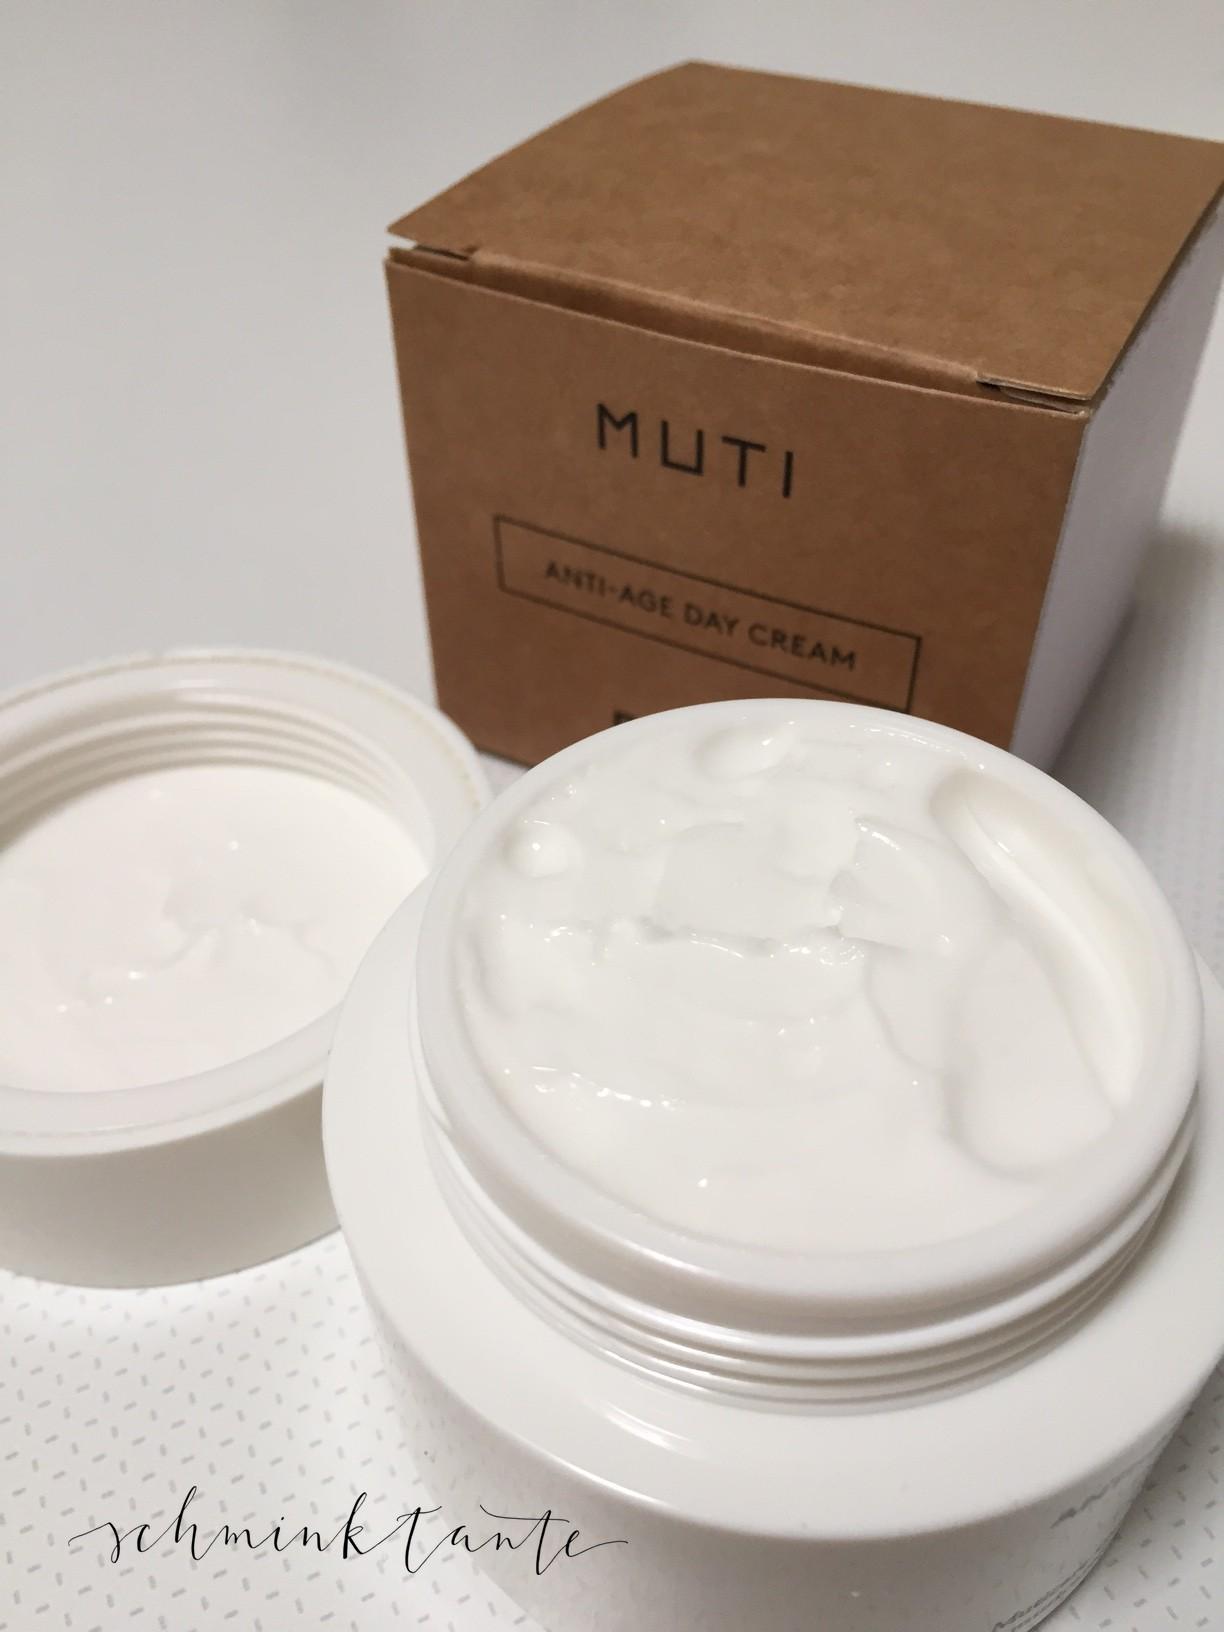 Muti Skincare, Anti Aging, Hautpflege, Hyaluronsäure